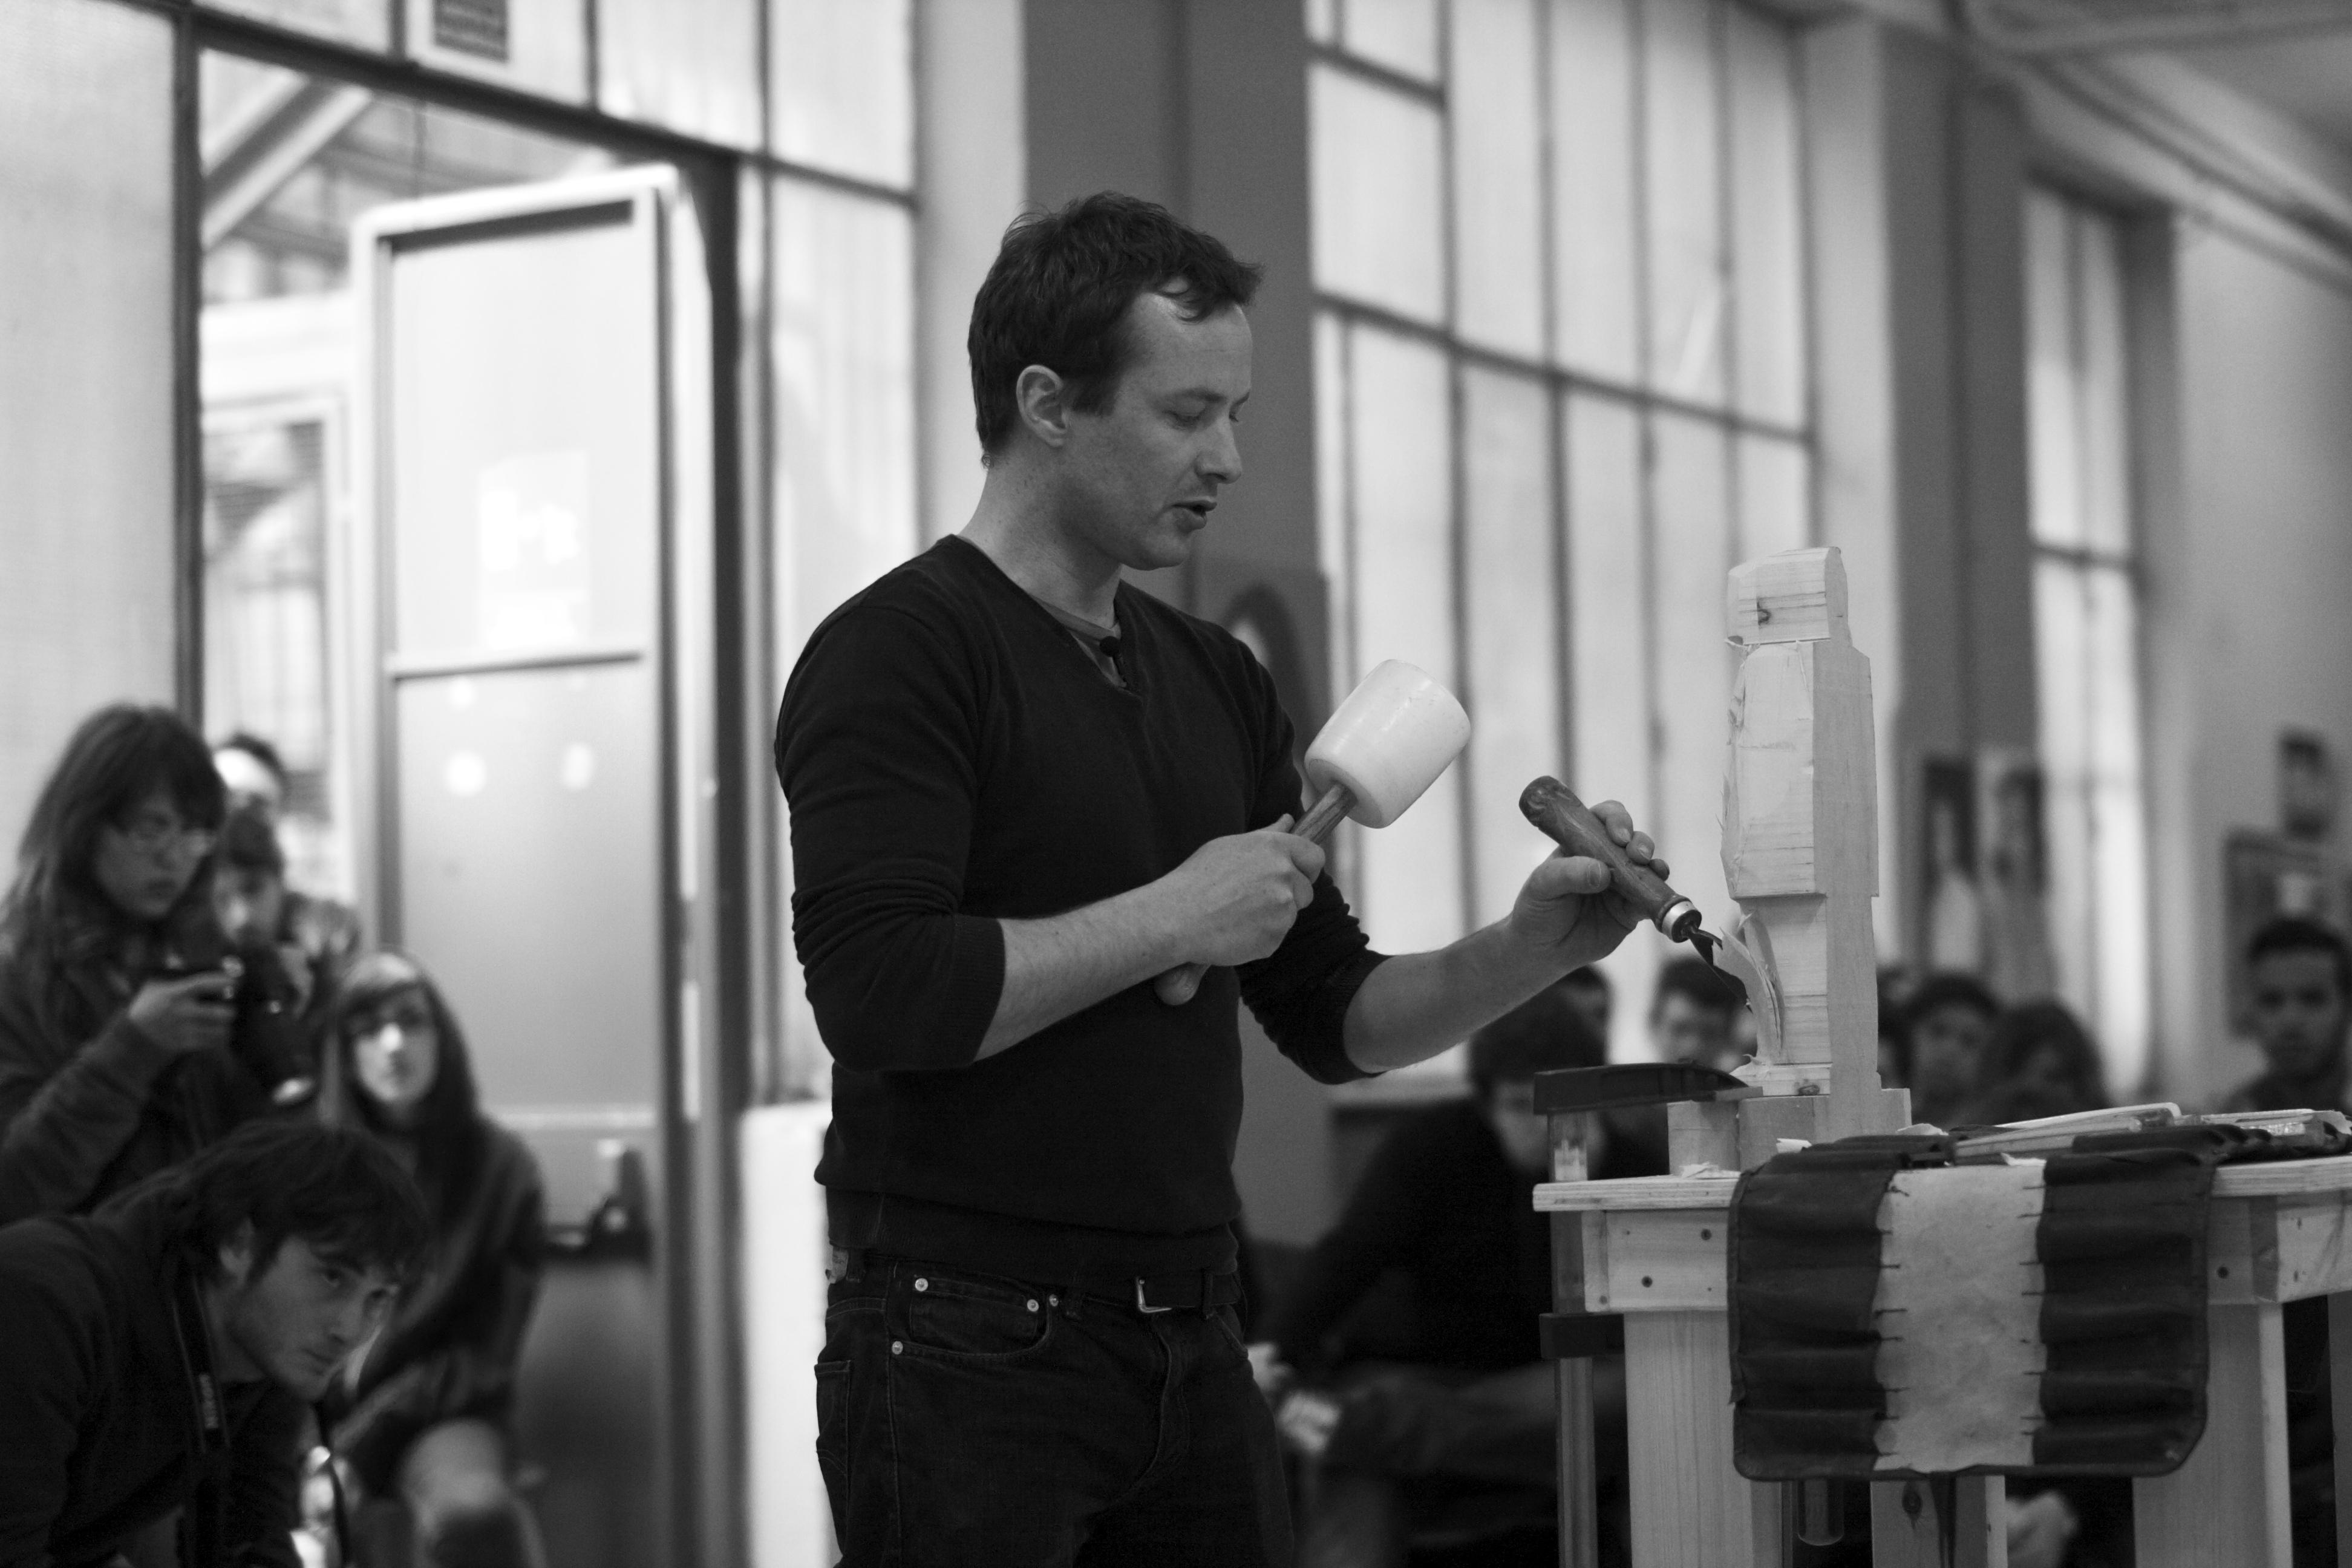 Flickr - Aron Demetz - Dialoghi e materia - Workshop a cura di Franco Reina62